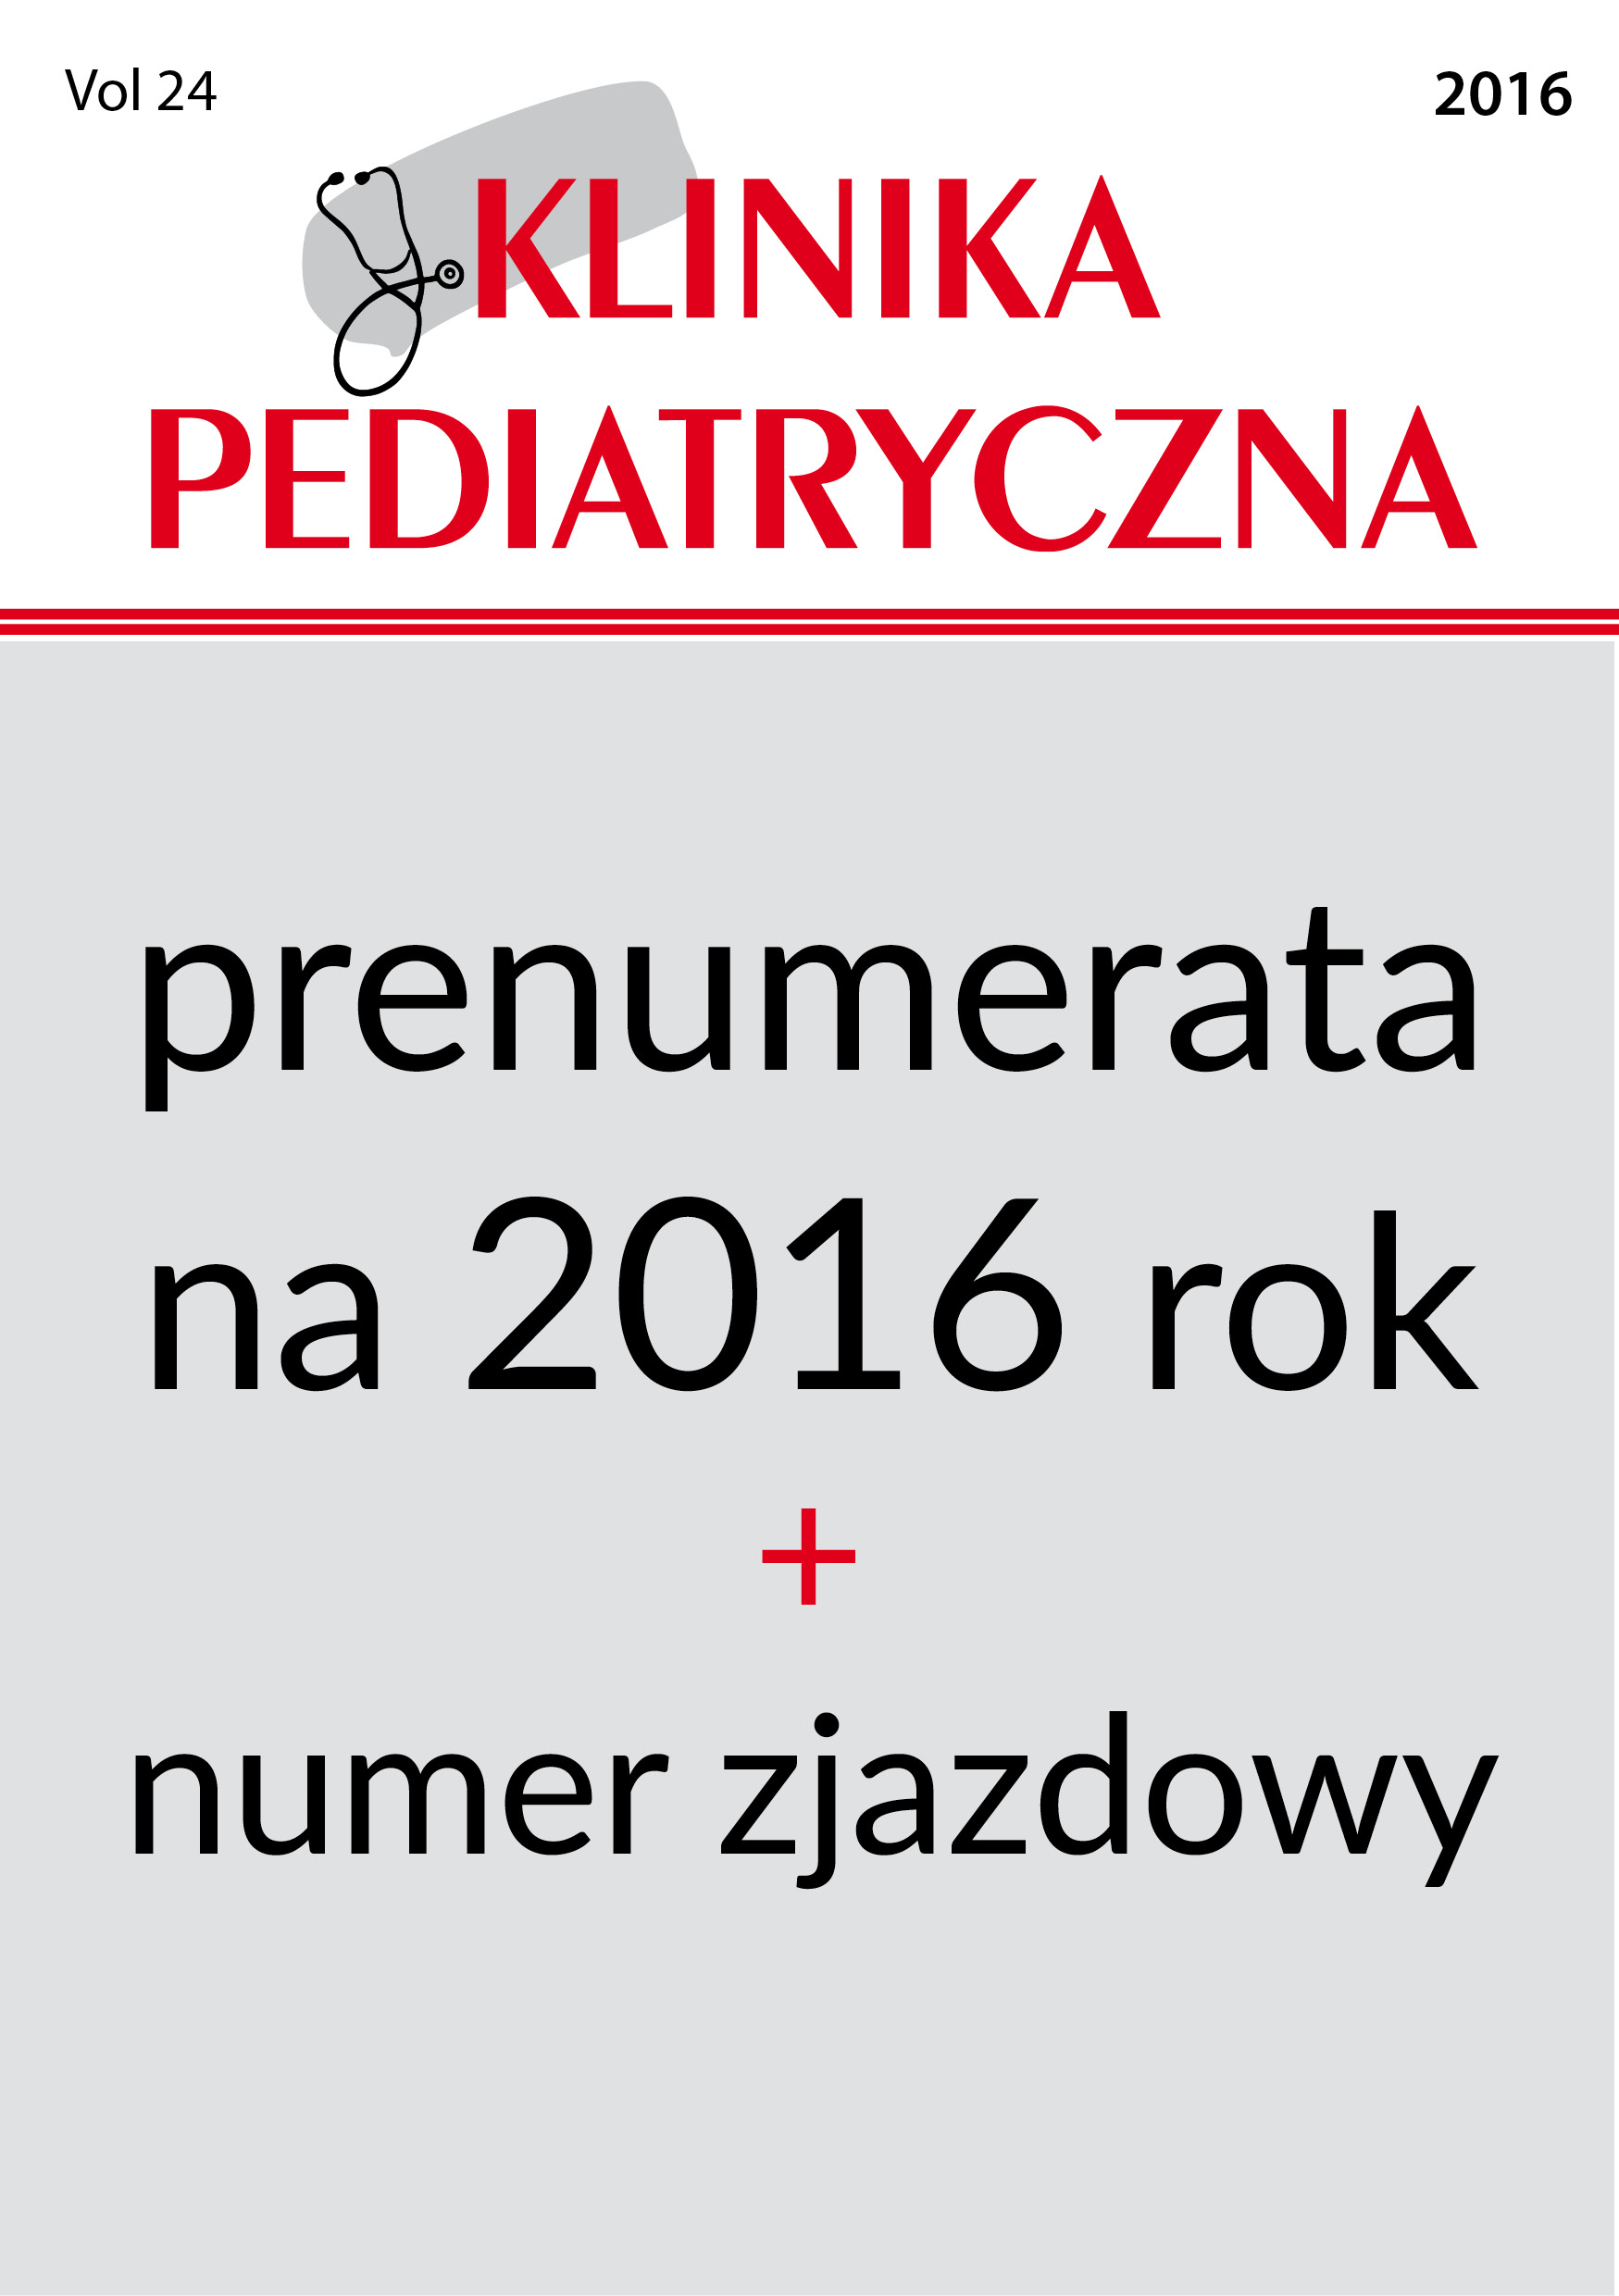 Prenumerata Kliniki Pediatrycznej na rok 2016 (4 numery + numer zjazdowy)